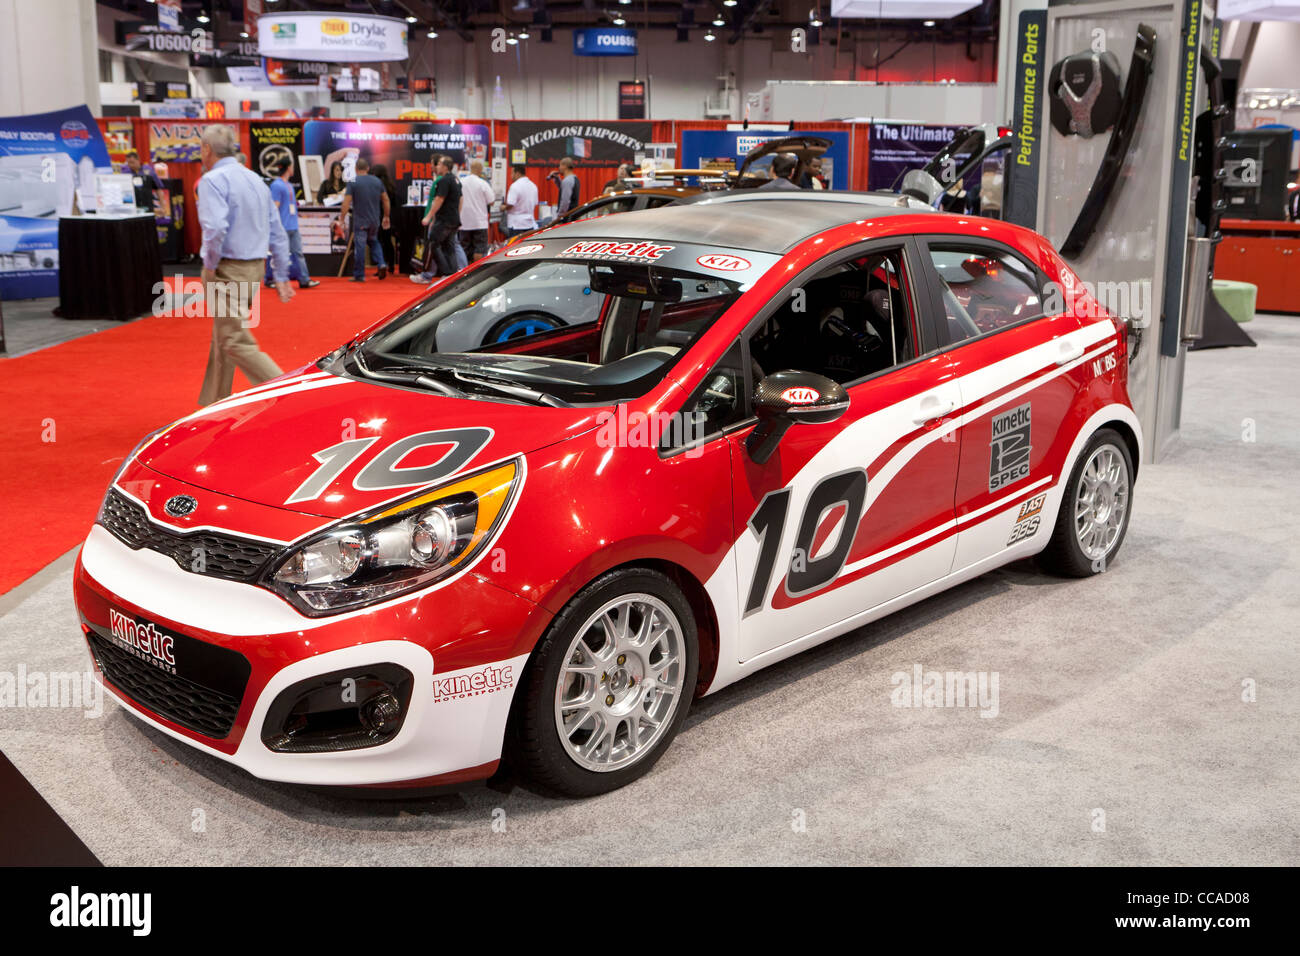 KIA kinetische Forte Koup Motorsport Rennwagen bei Auto-show Stockbild